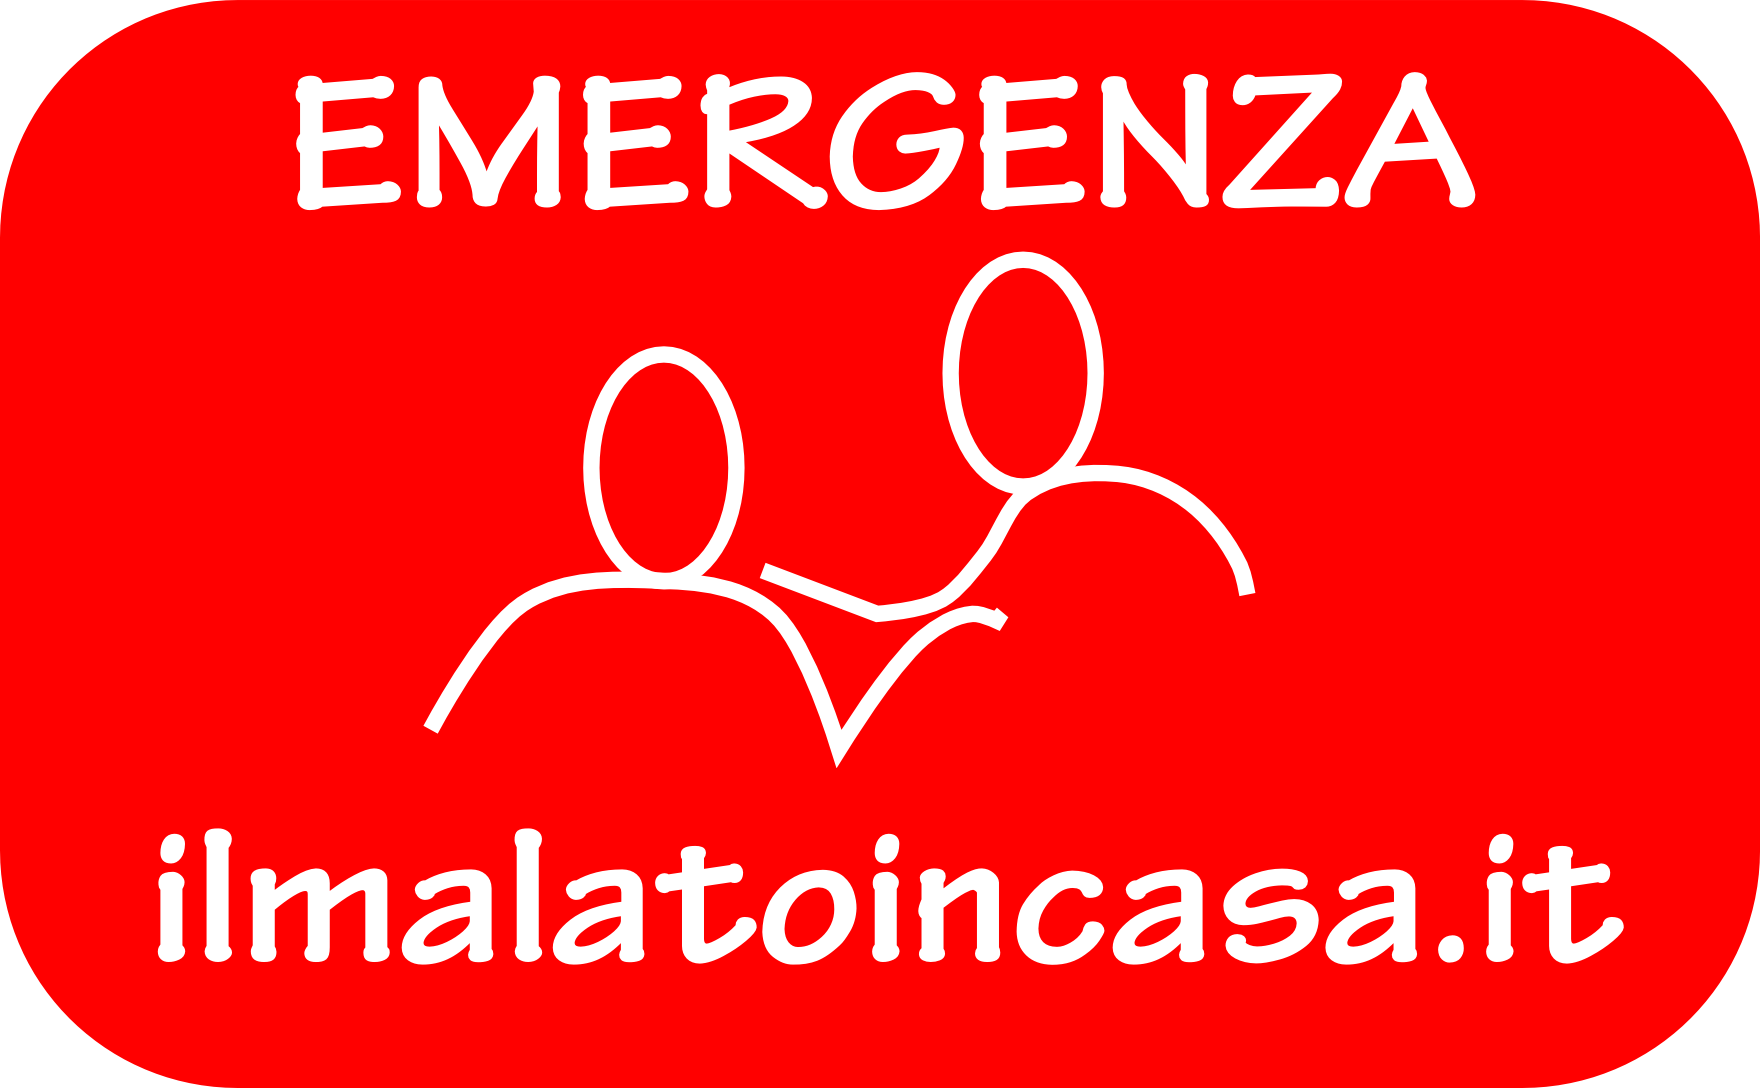 bottone rosso emergenza